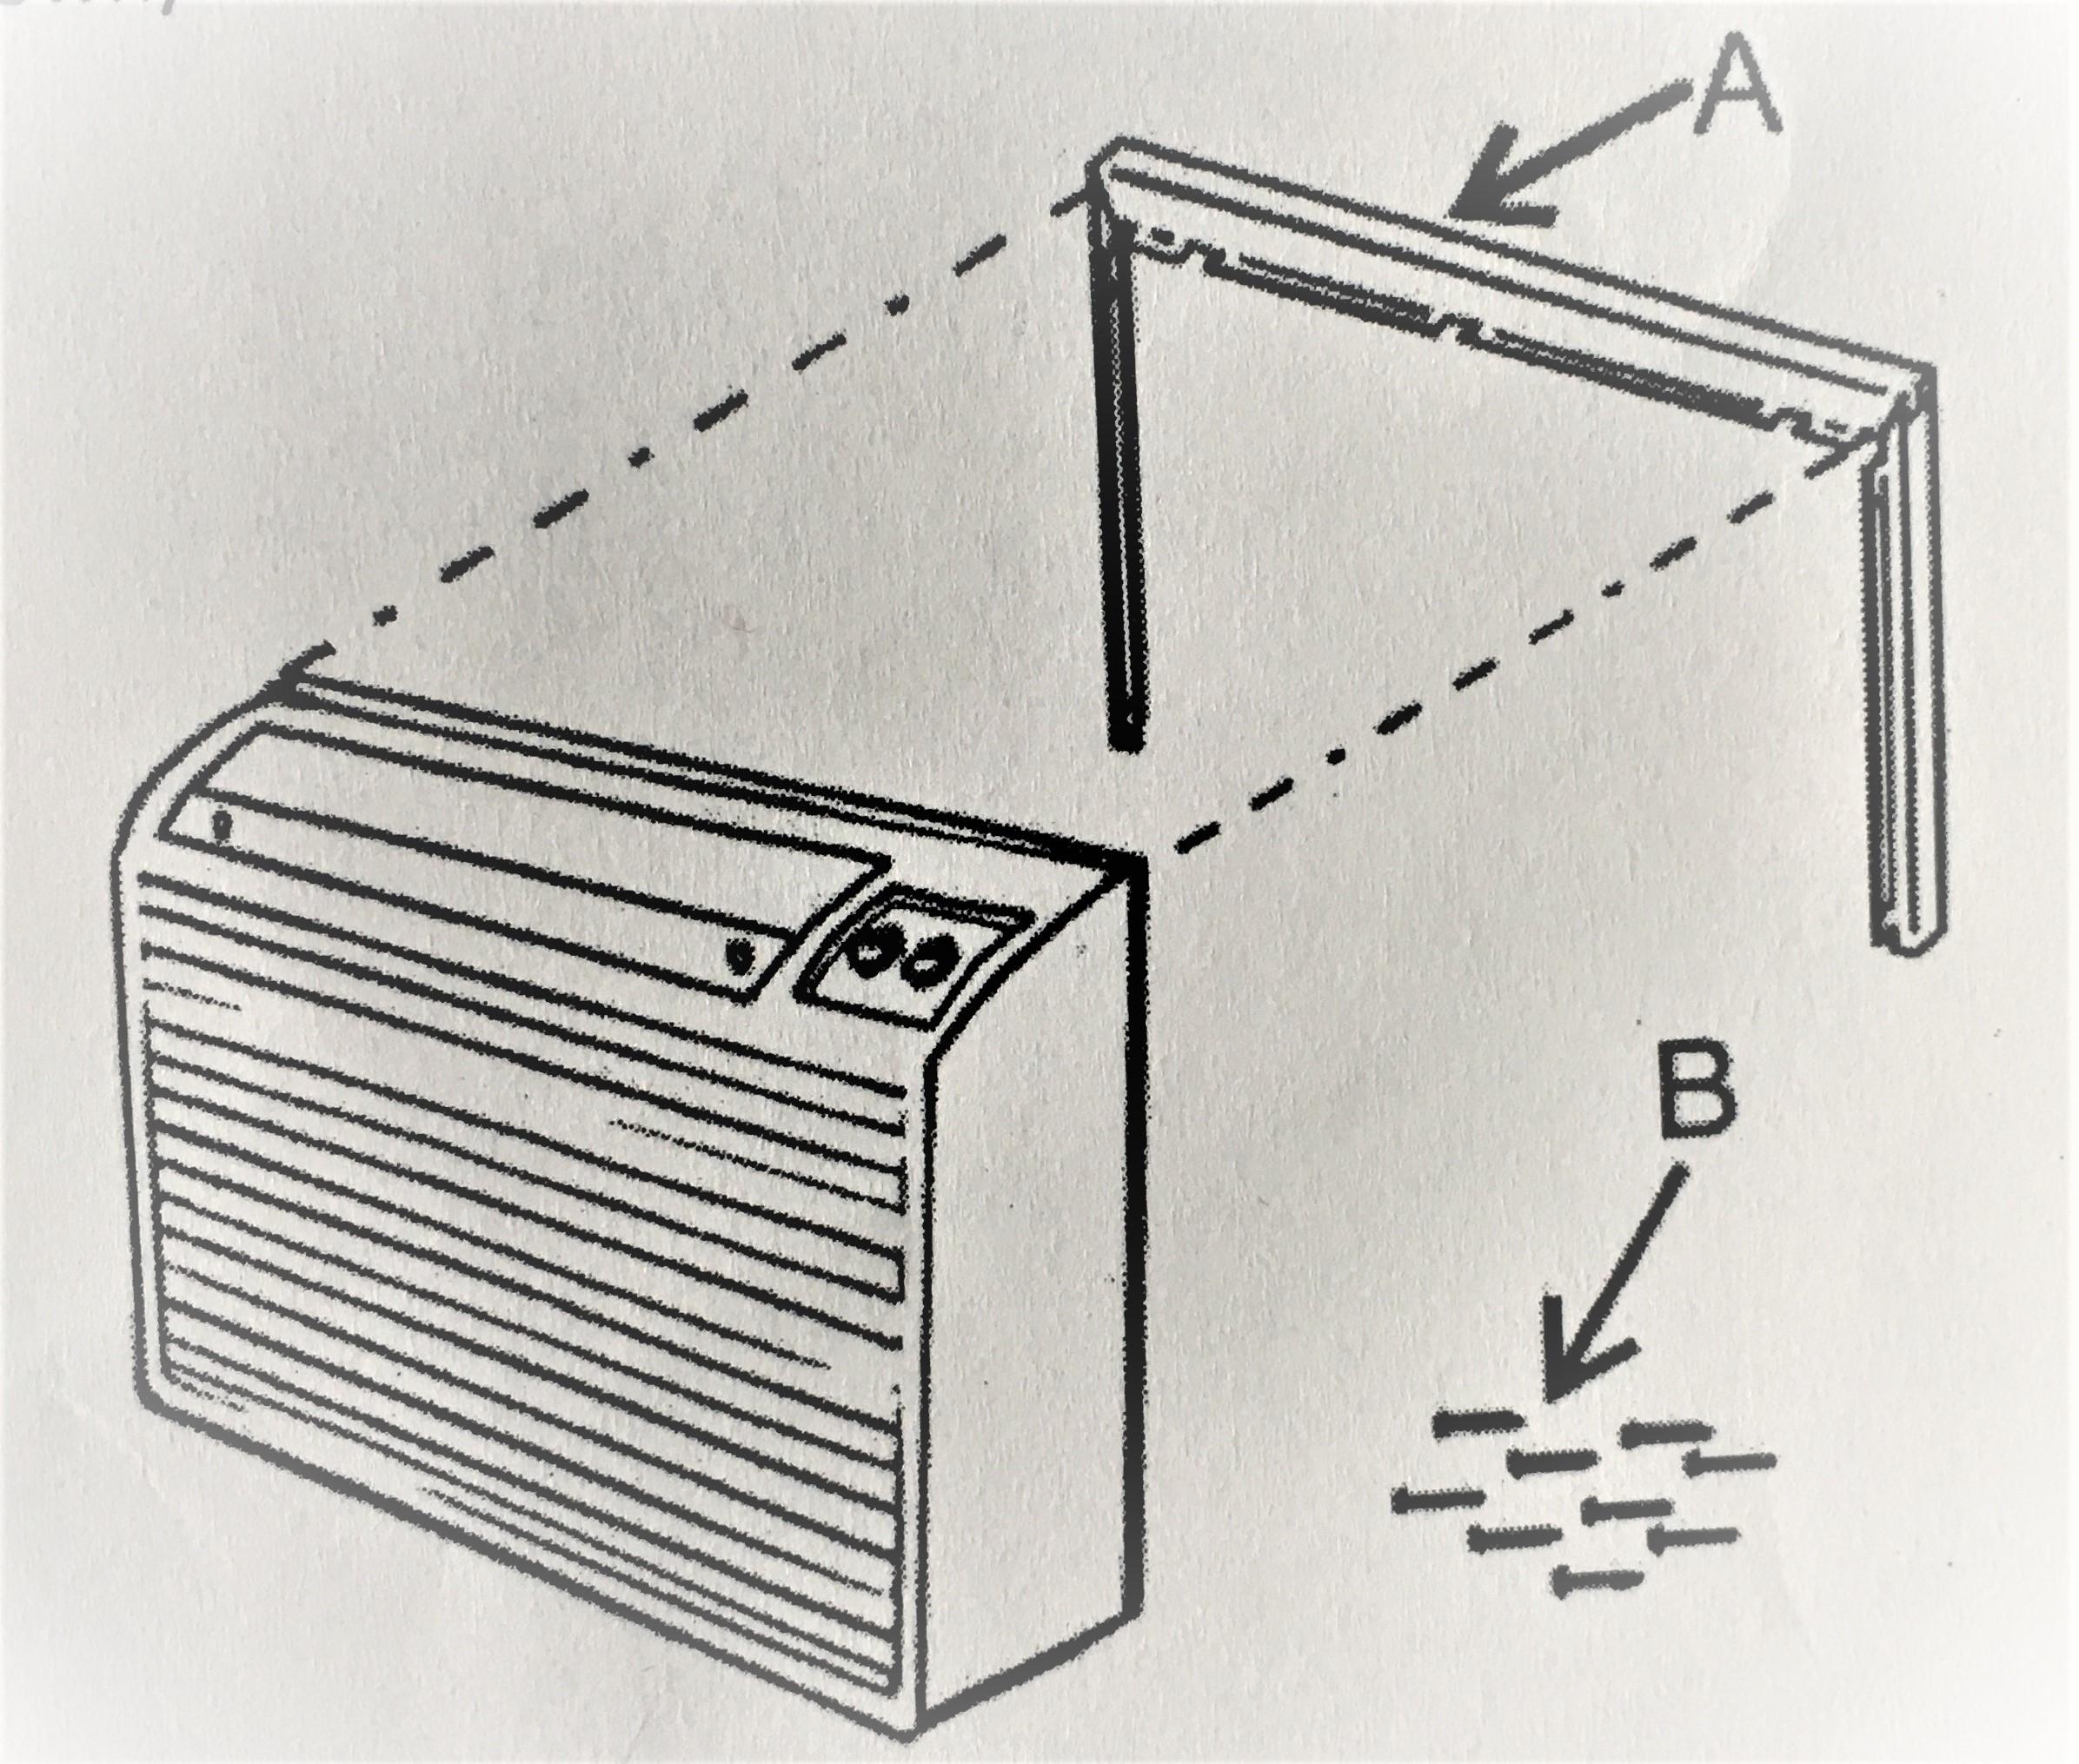 fedders-27-inch-through-the-wall-adapter-sleeve-kit.jpg